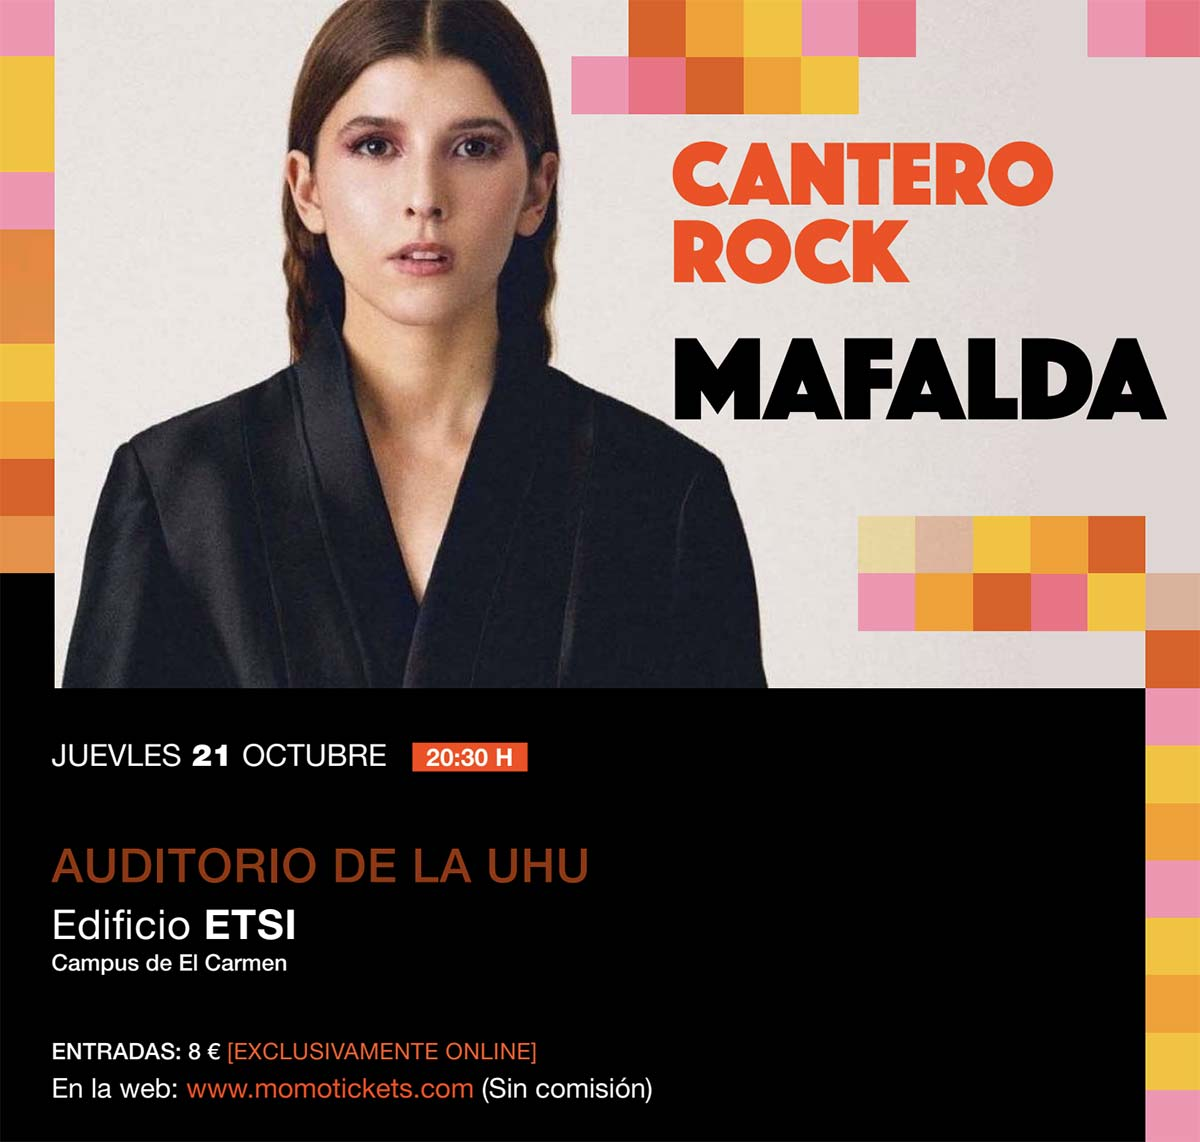 mafalda de bulgaria universidad de Huelva Cantero Rock